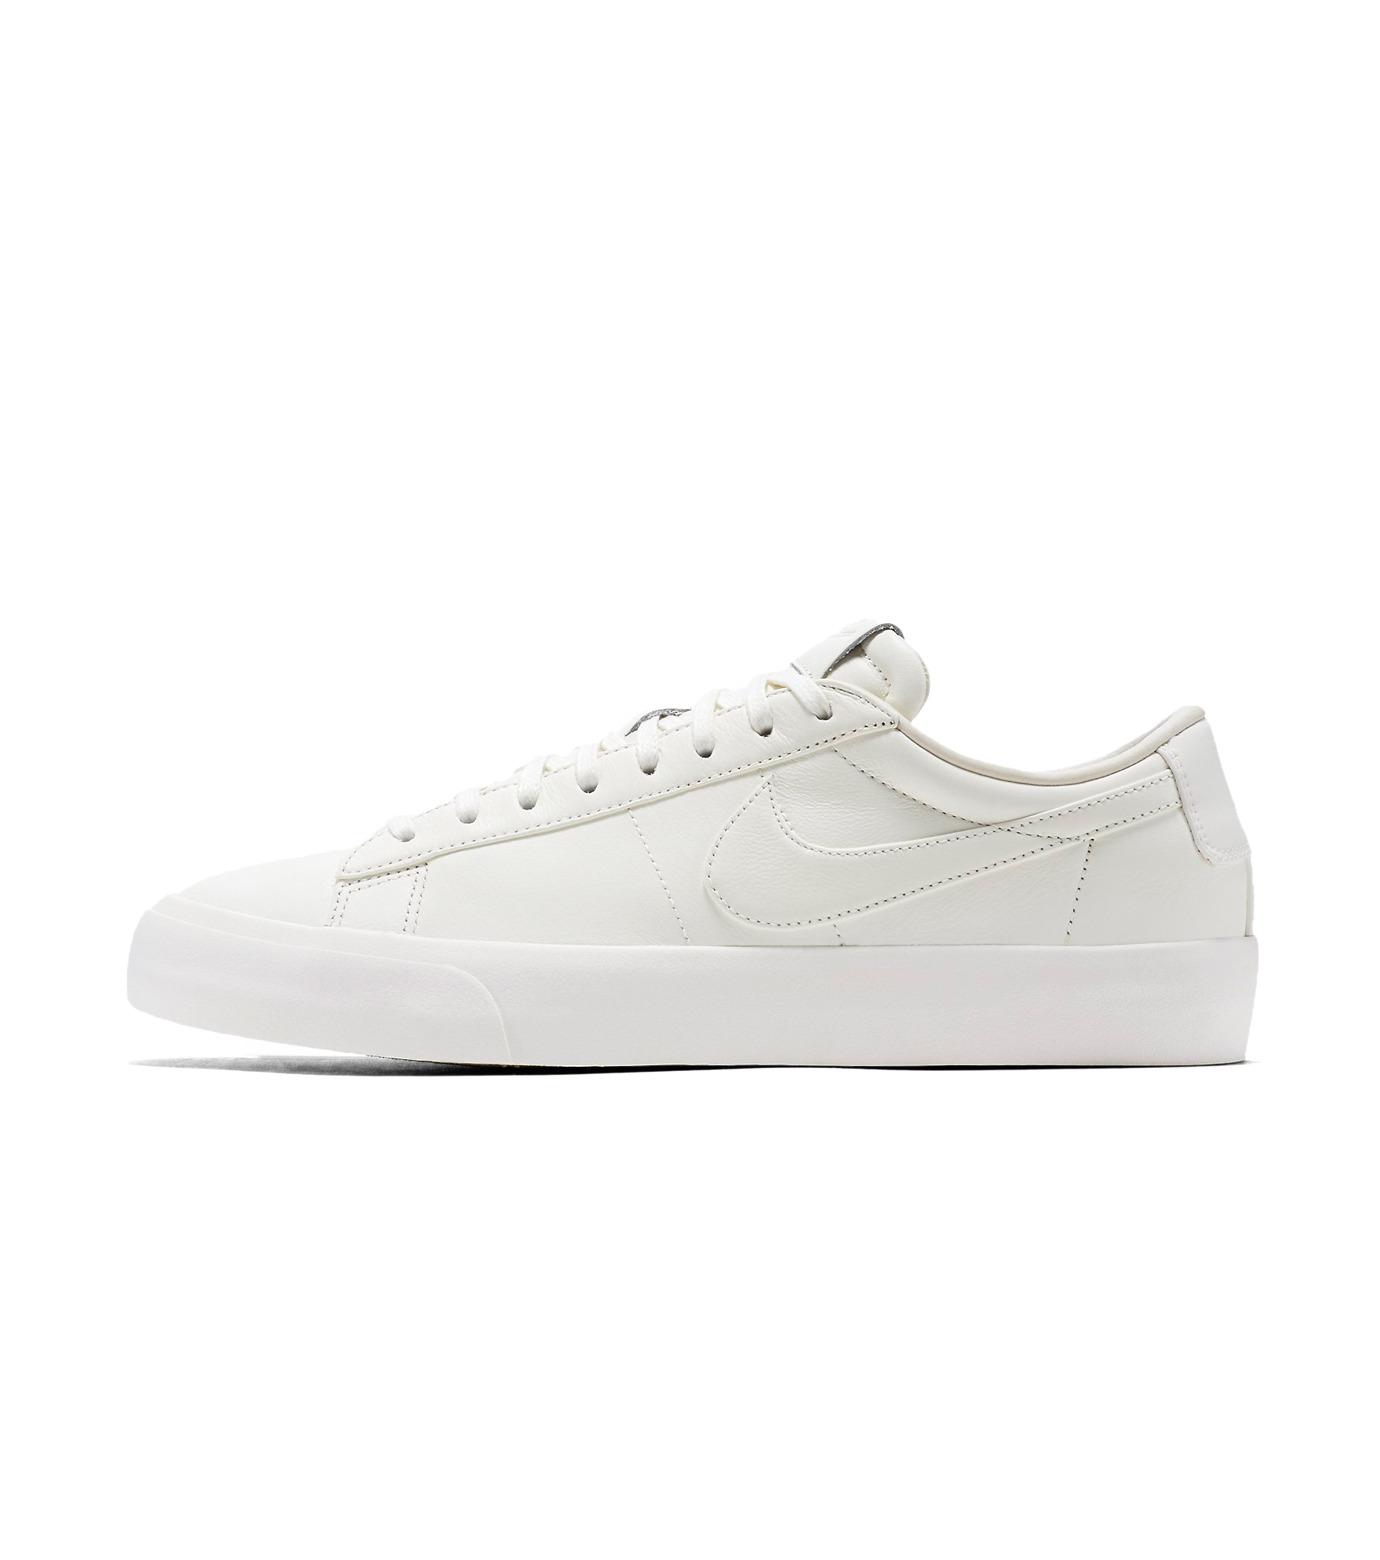 NIKE(ナイキ)のBLAZER STUDIO LOW-WHITE(シューズ/shoes)-904804-100-4 拡大詳細画像3